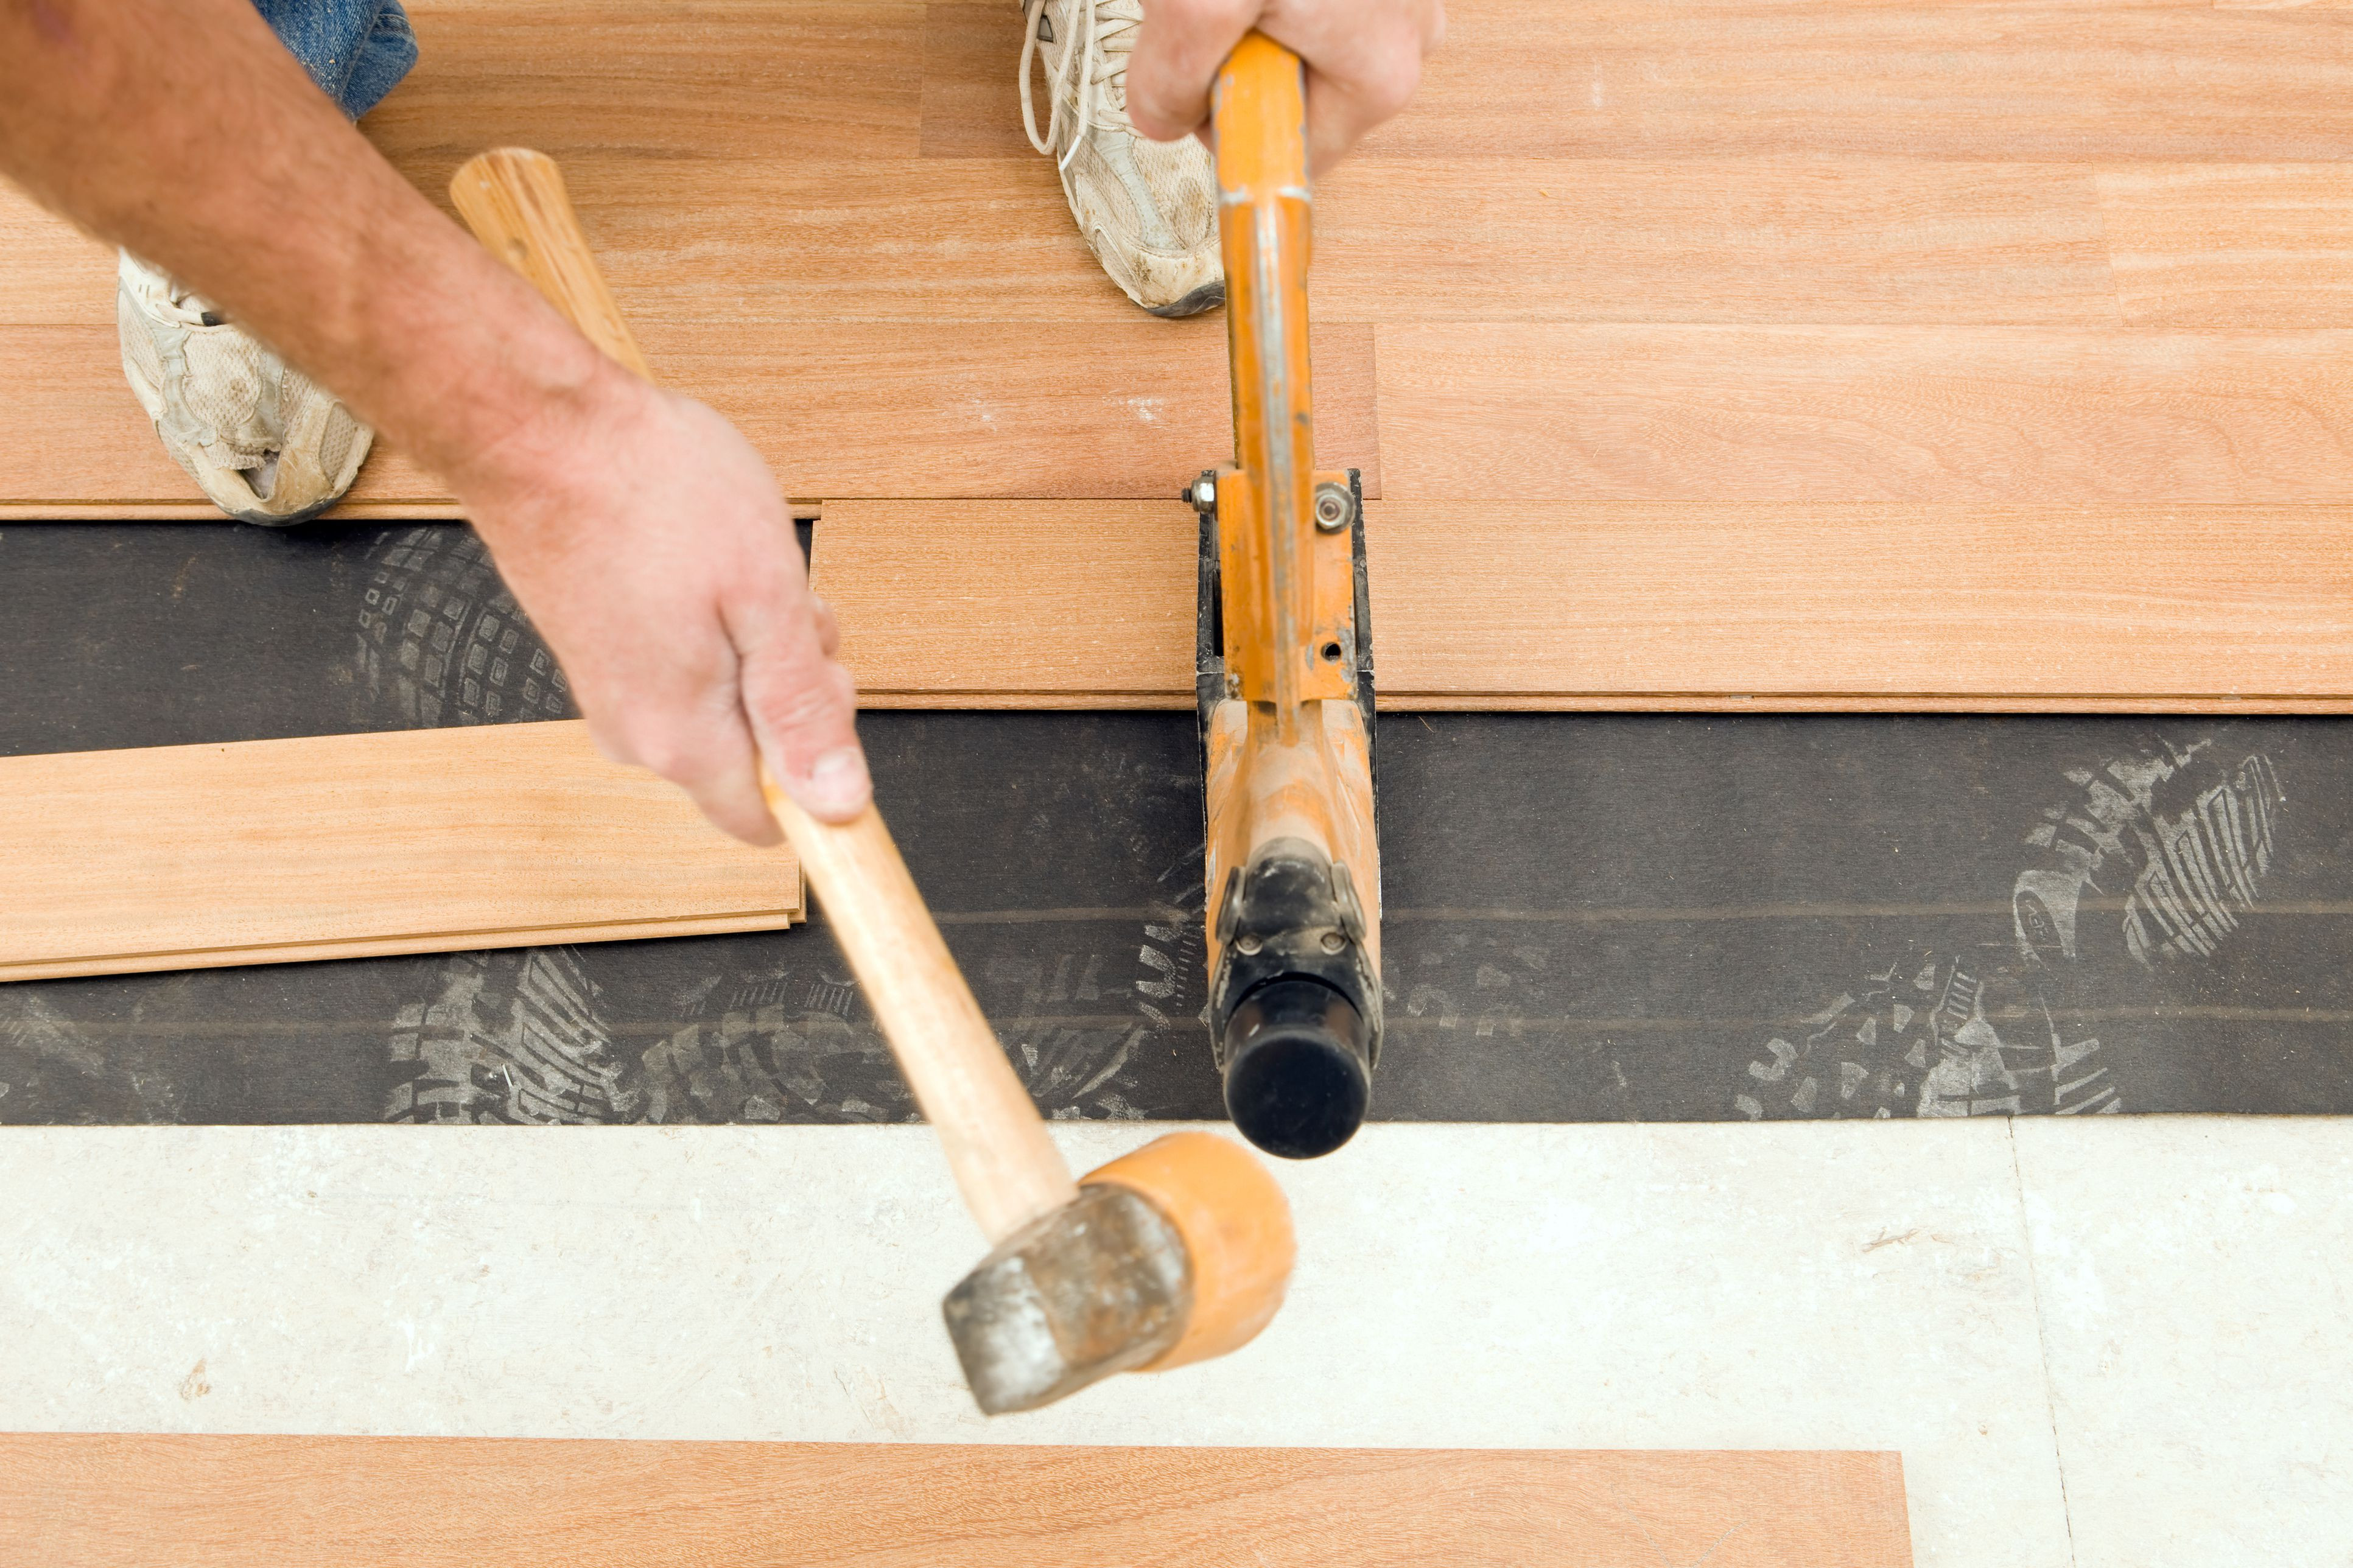 walnut hardwood floor colors of the hardest wood flooring you can buy within worker installing new cumuru hardwood floor 186852280 5827f3bc5f9b58d5b11372fc